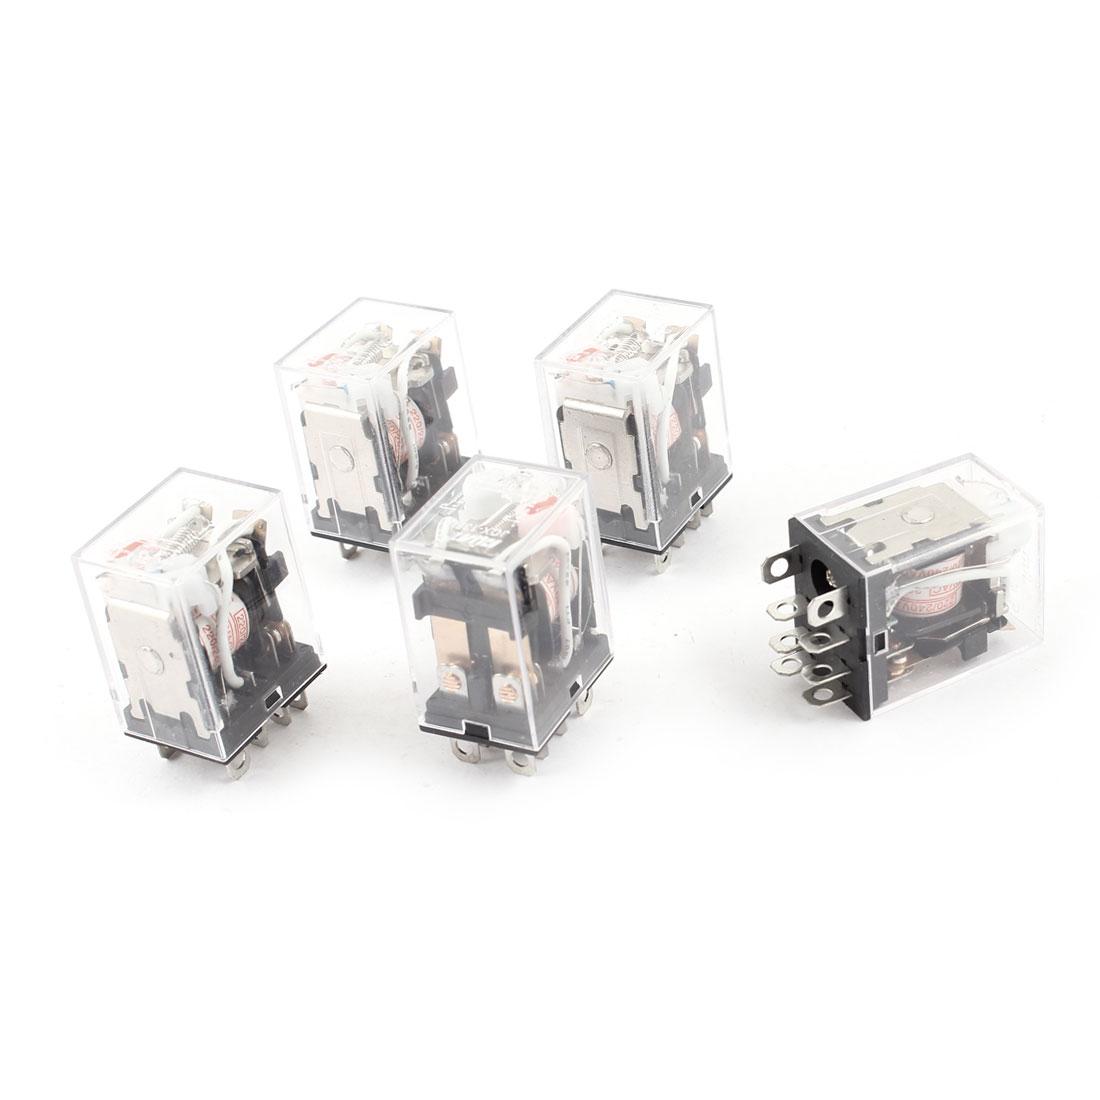 JQX-13FL AC 220/240V Coil 8-Pin DPDT Red LED Light Electromagnetic Relay 5 Pcs